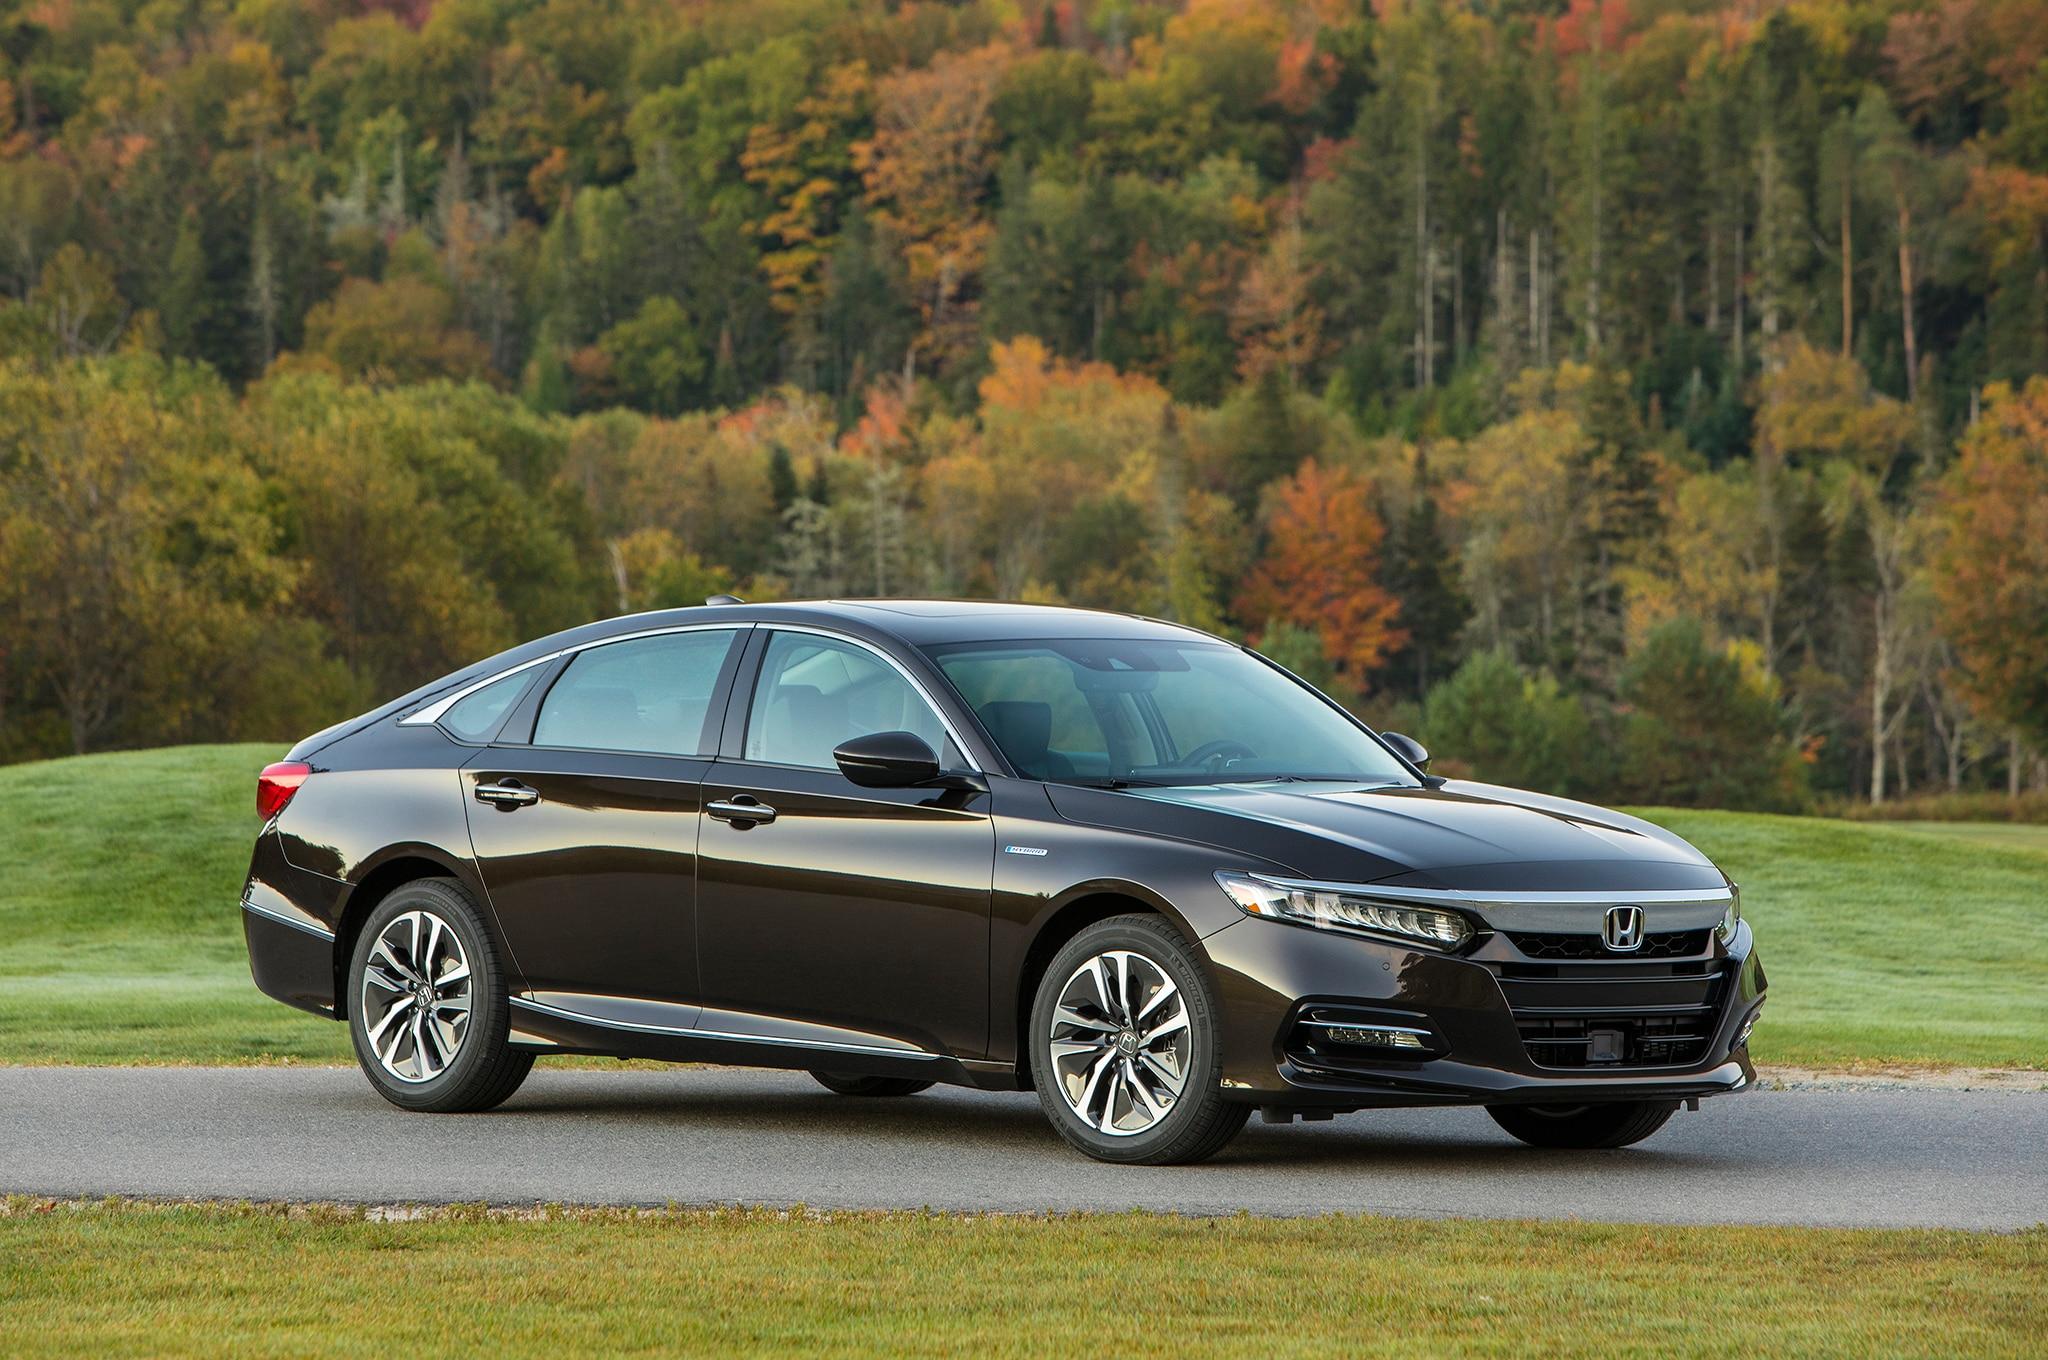 2018 Honda Accord Hybrid Front Three Quarter 03